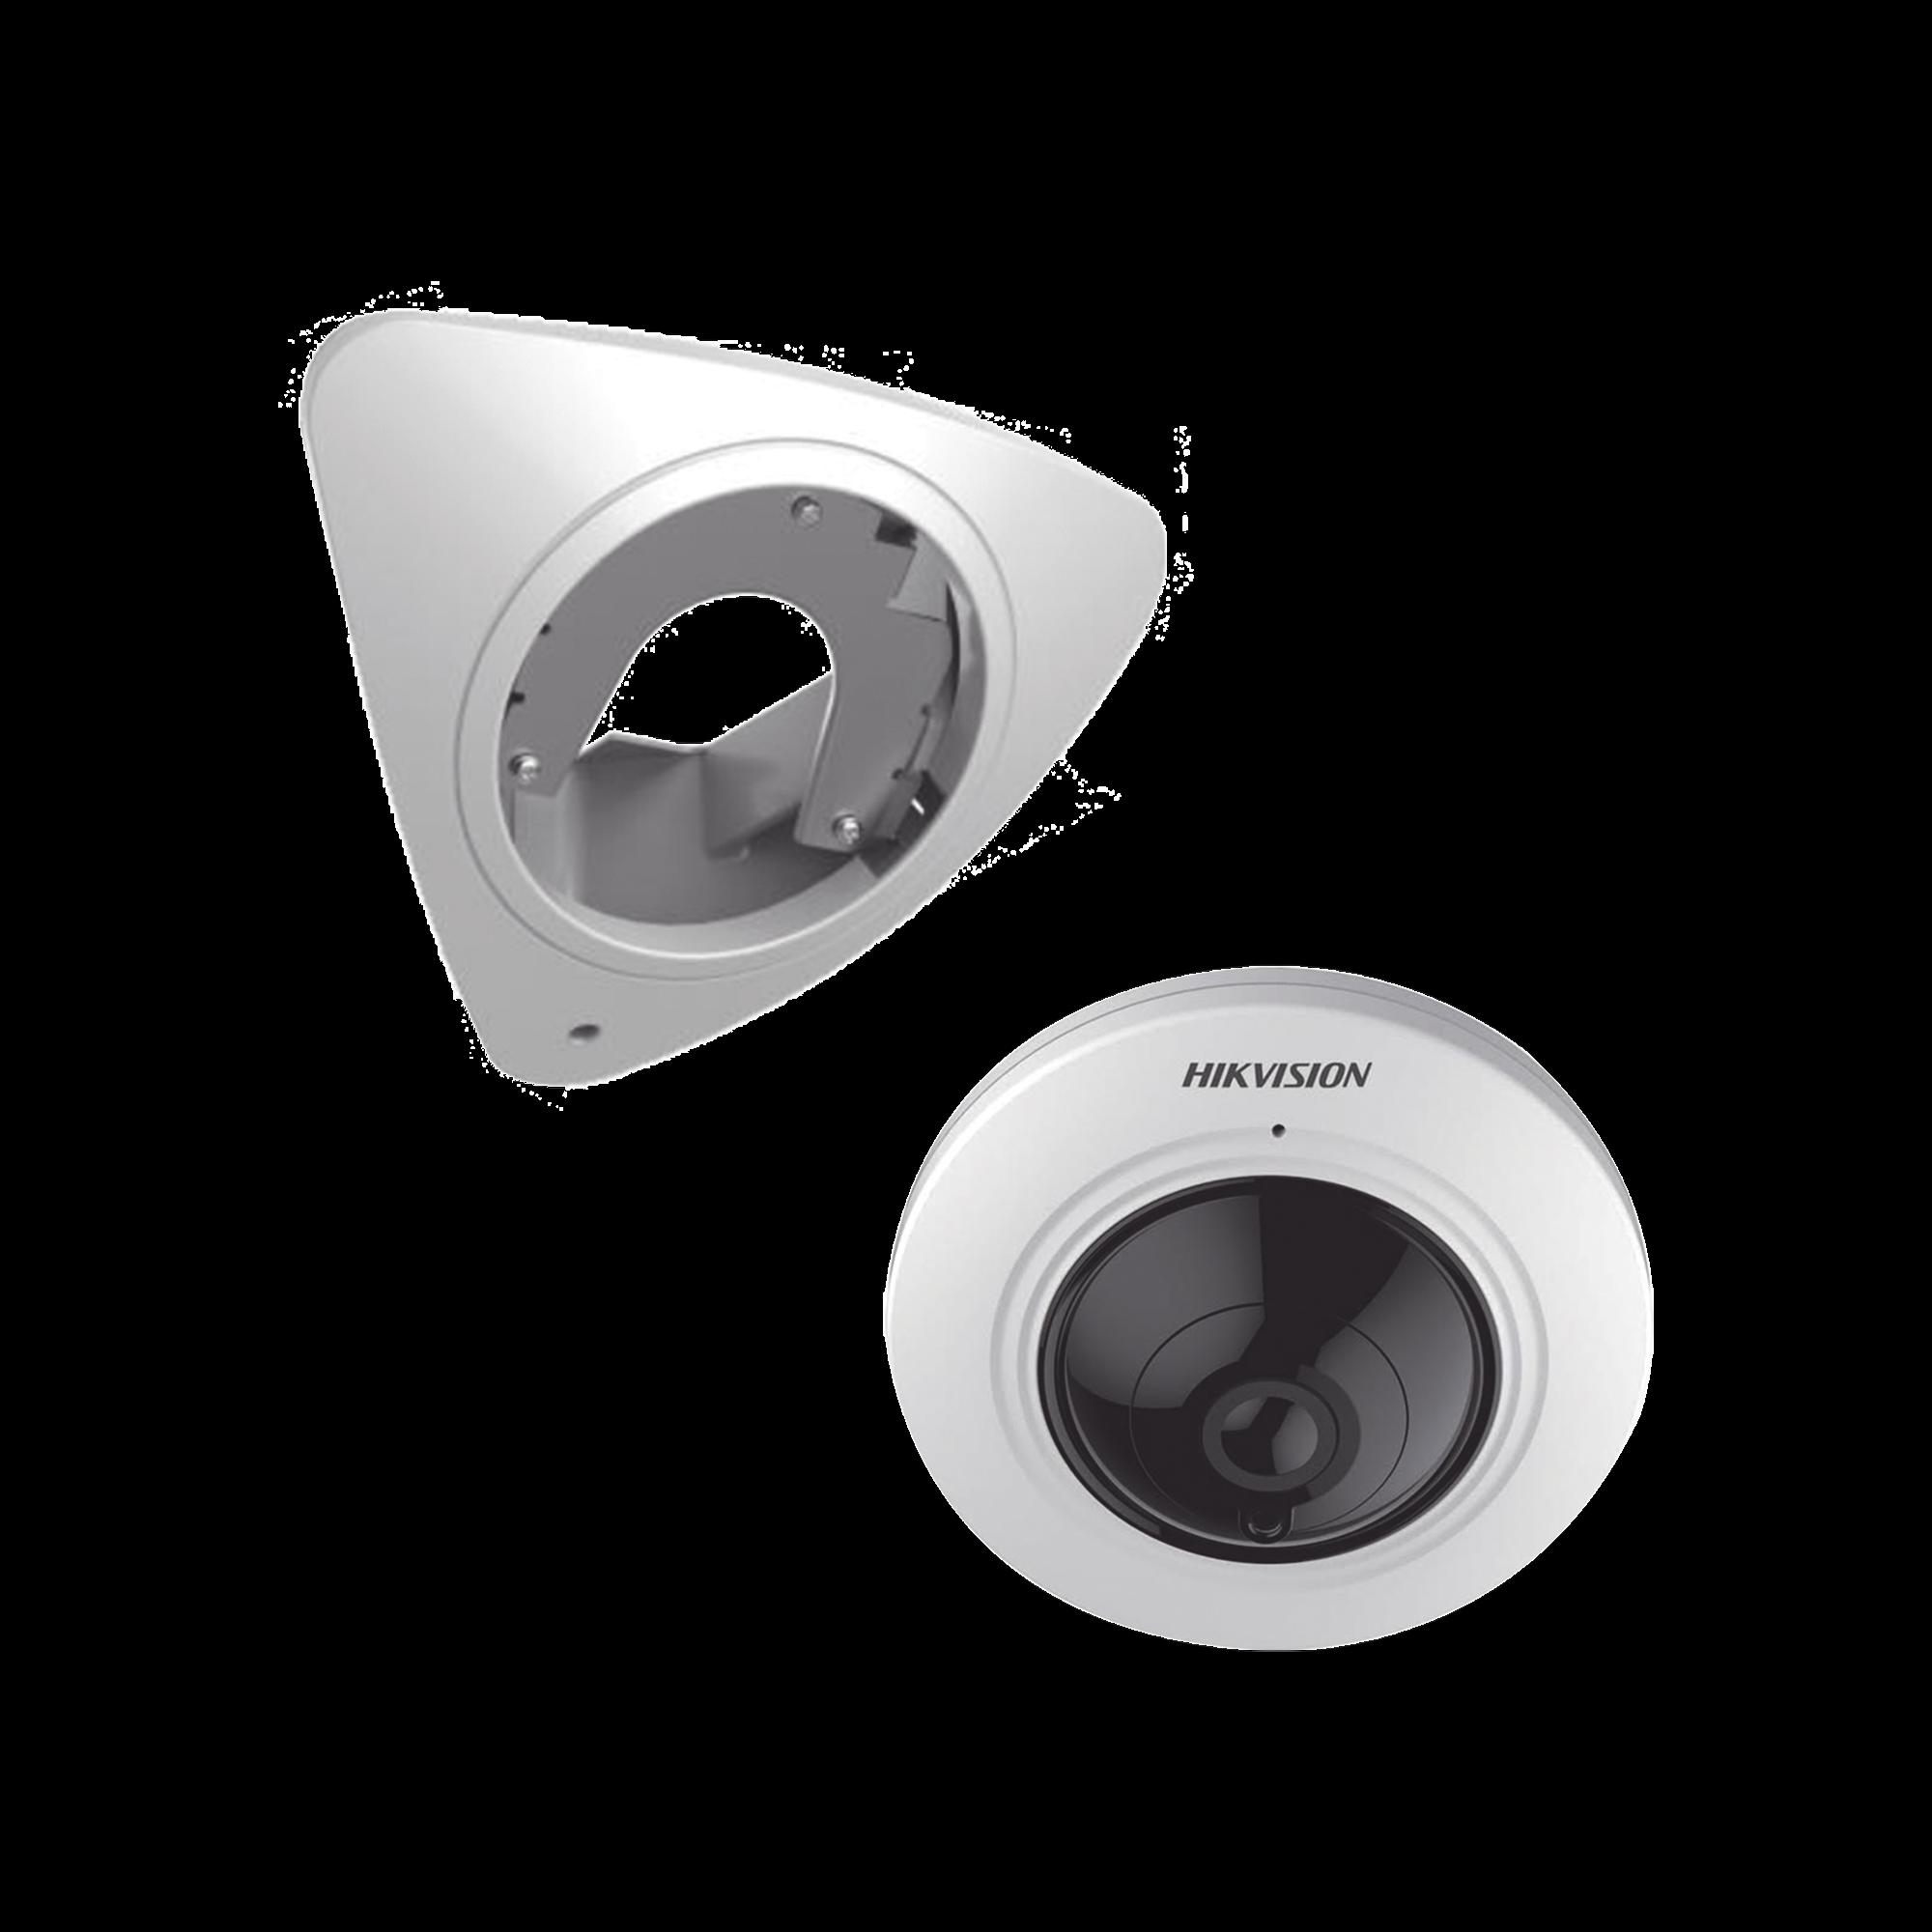 (Incluye Montaje de Esquina) Panorámica TURBOHD 5 Megapixel / 20 mts IR / Micrófono Integrado / Interior / Múltiples Vistas Adicionales / 180? / 360?